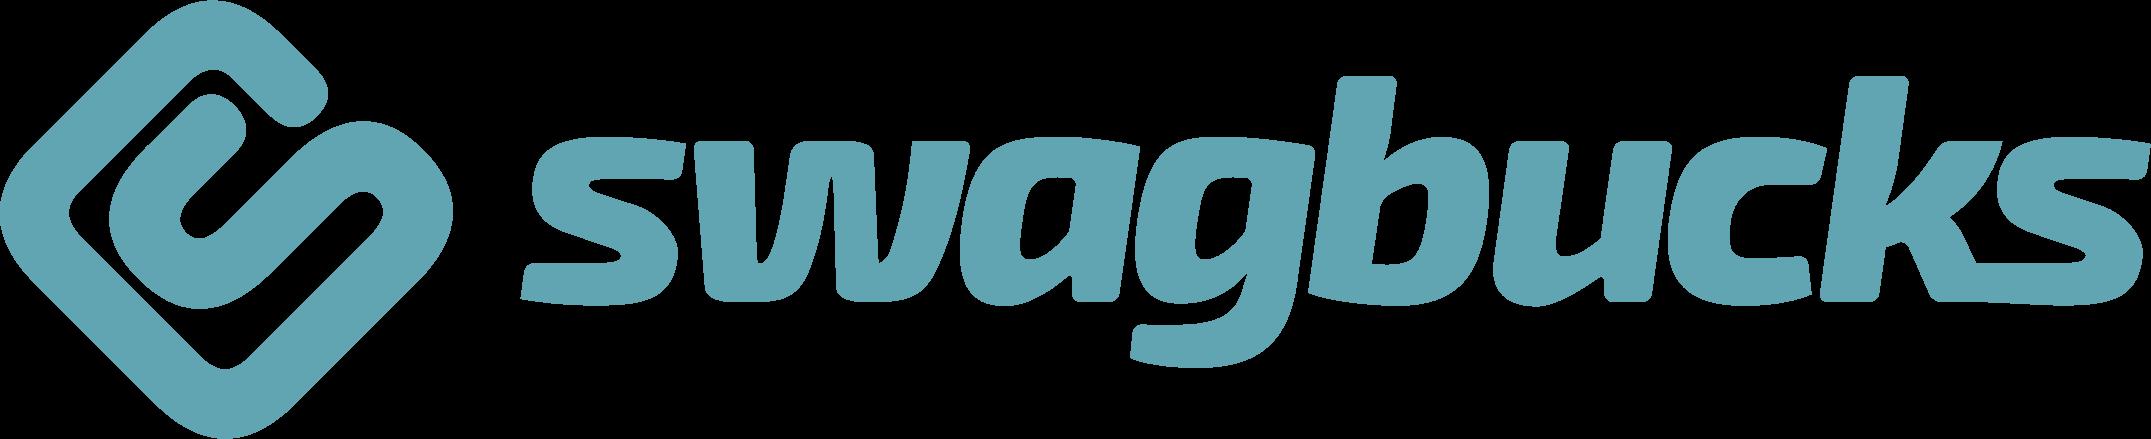 swagbucks-logo